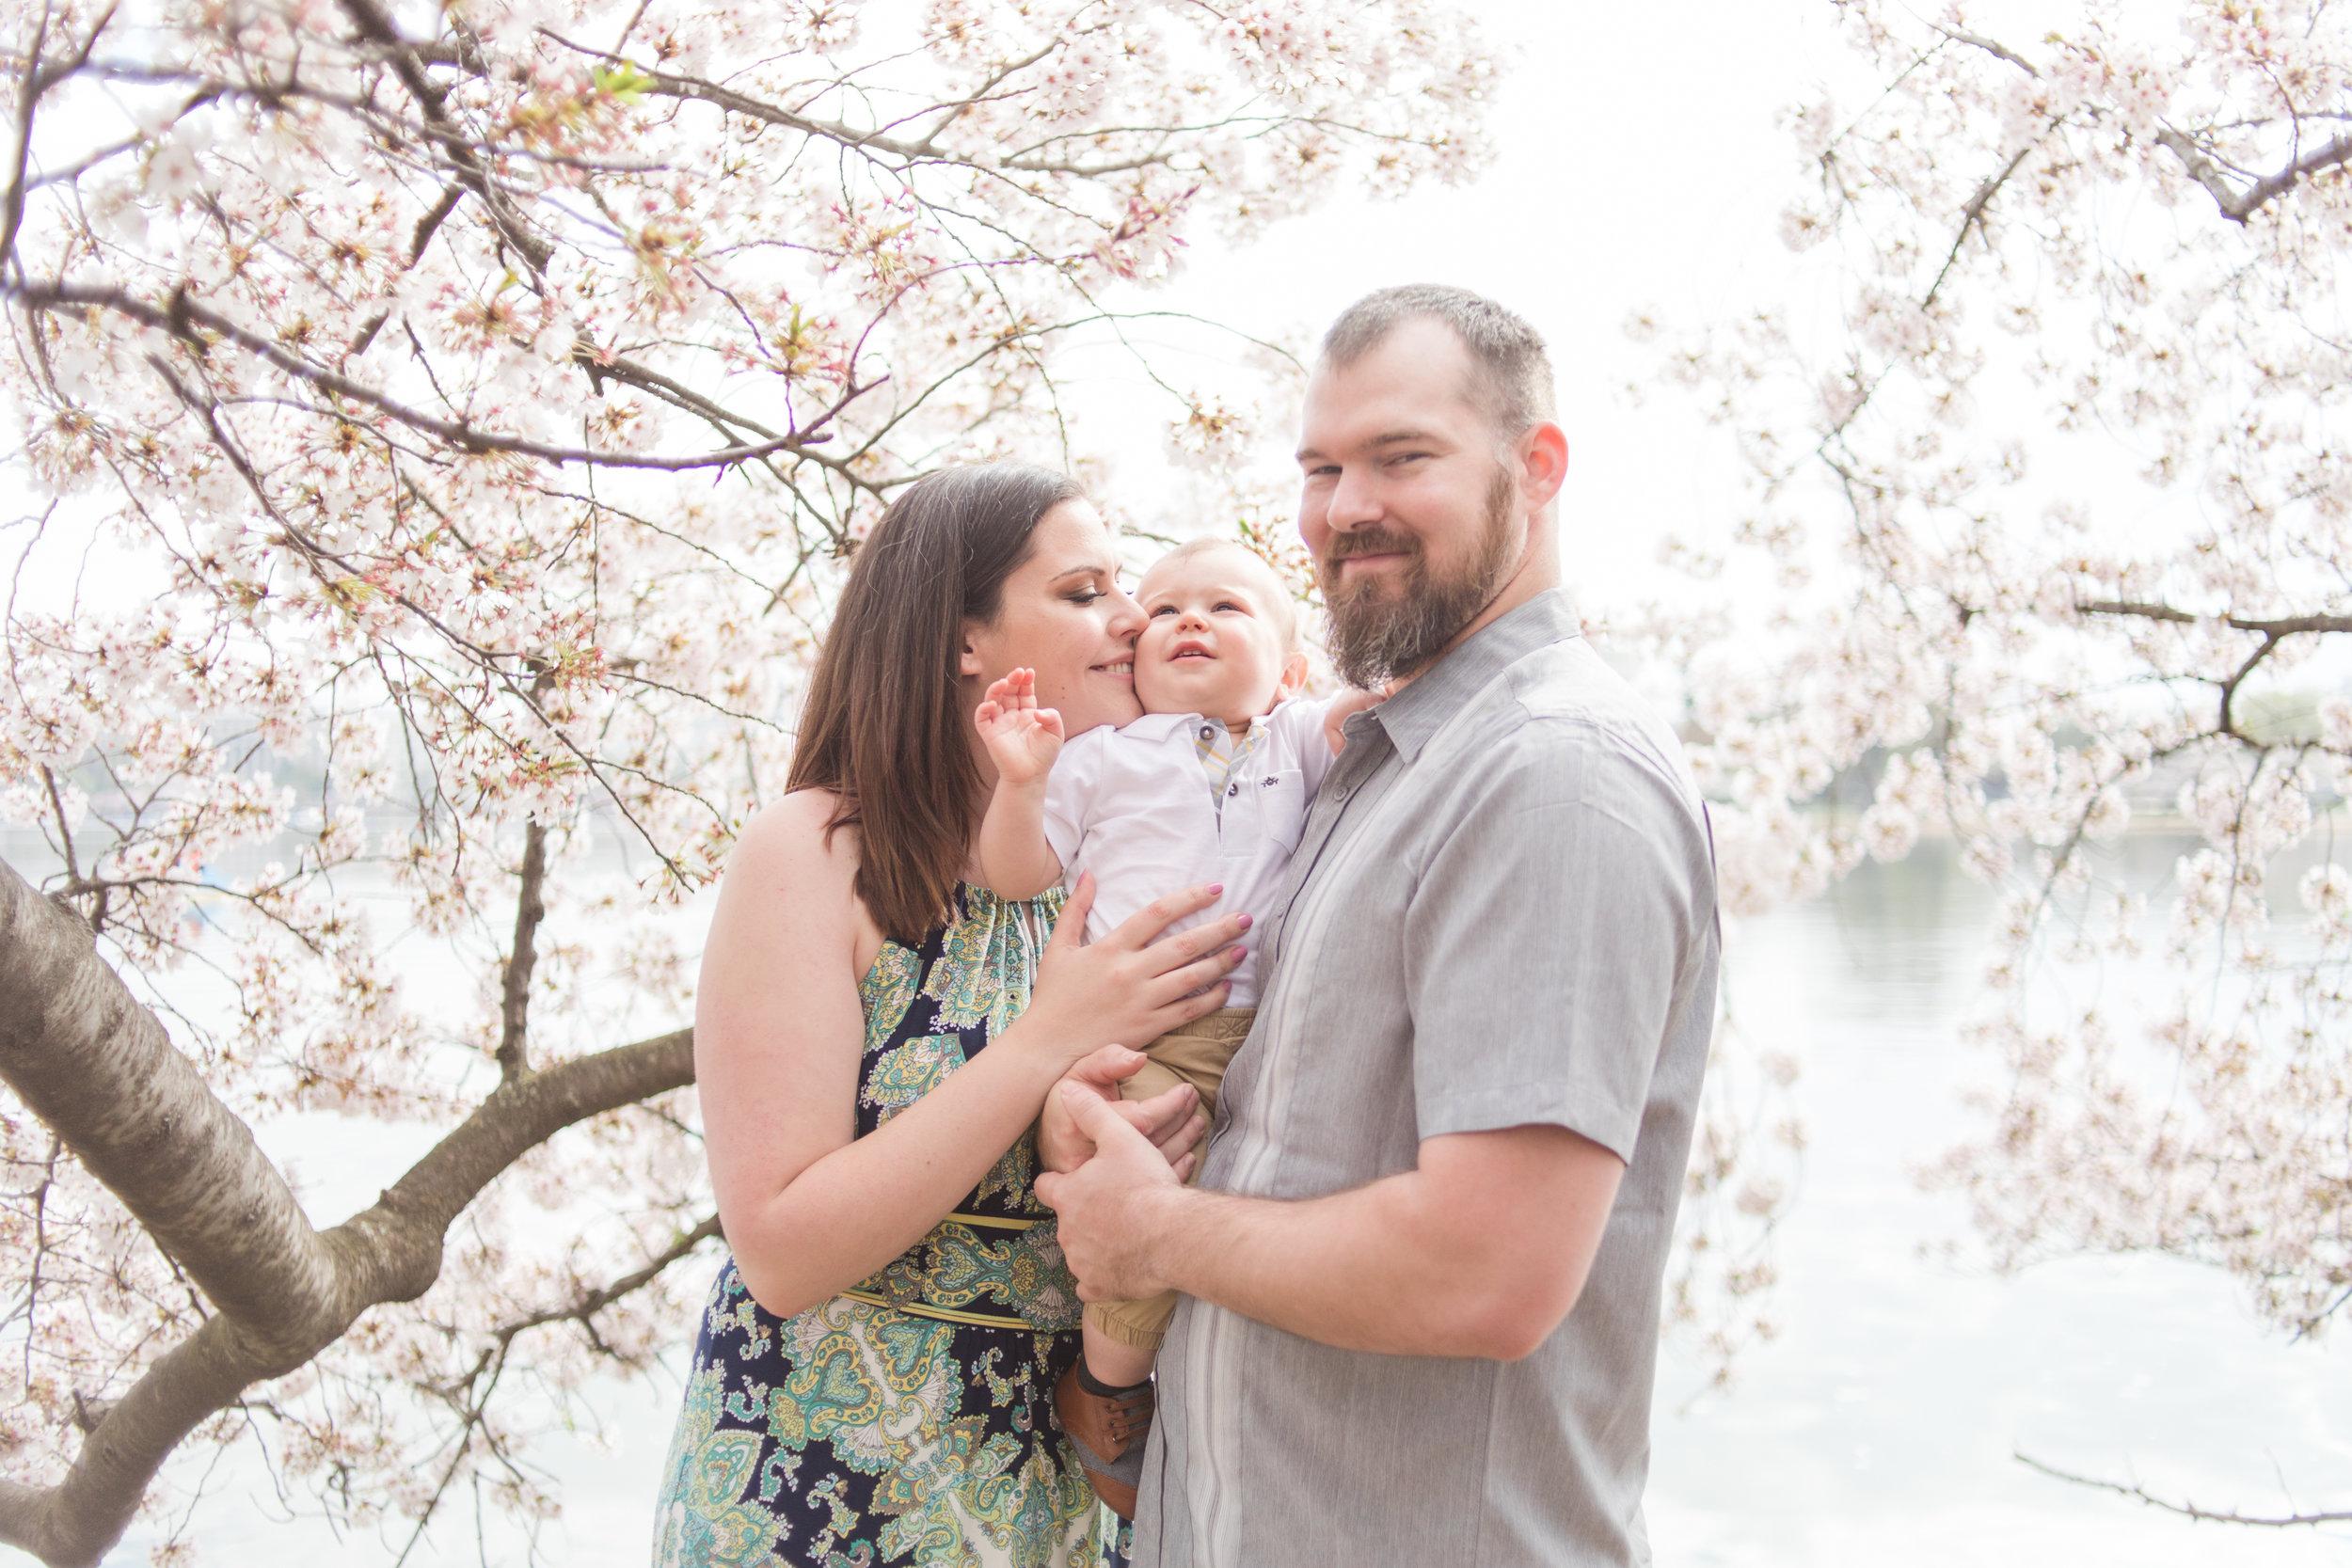 mjmp shannanjohn dc cherry blossom engagement session-12.jpg